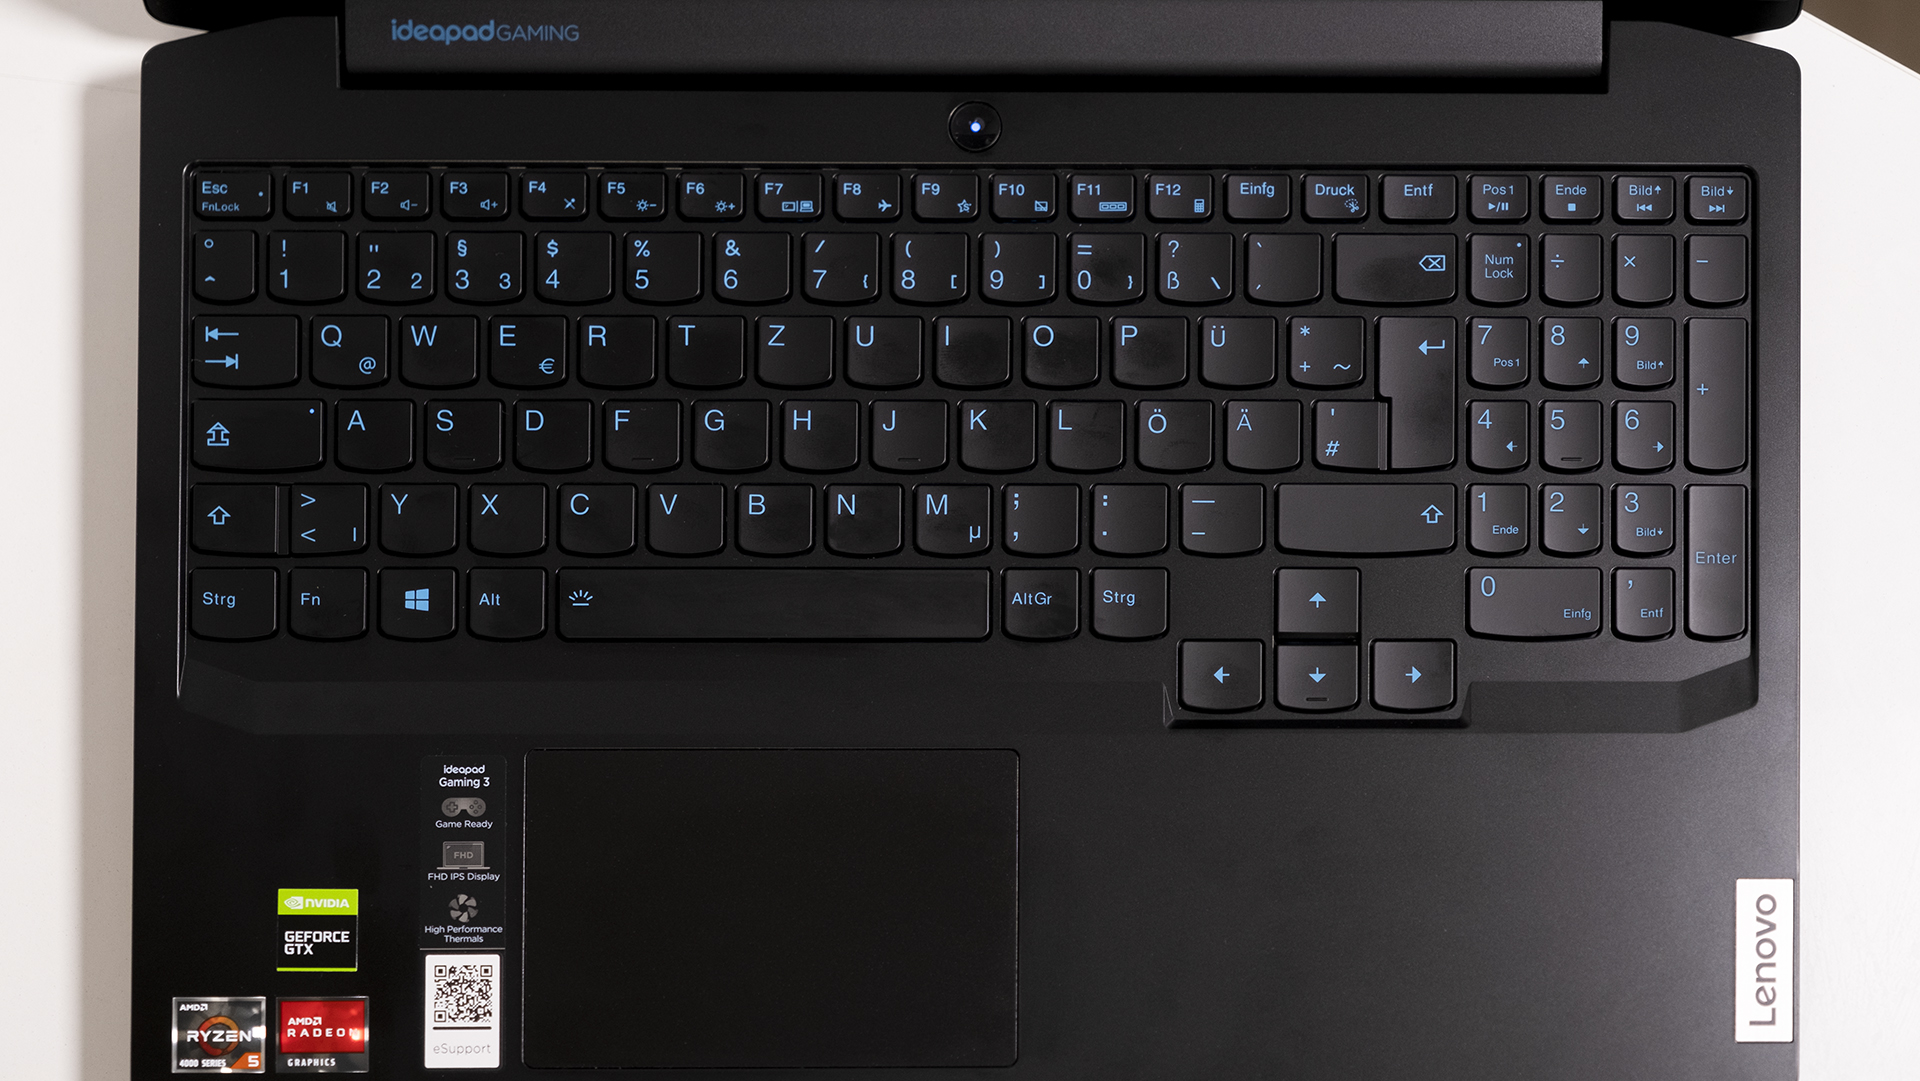 Lenovo IdeaPad Gaming 3 AMD Tastatur Totale